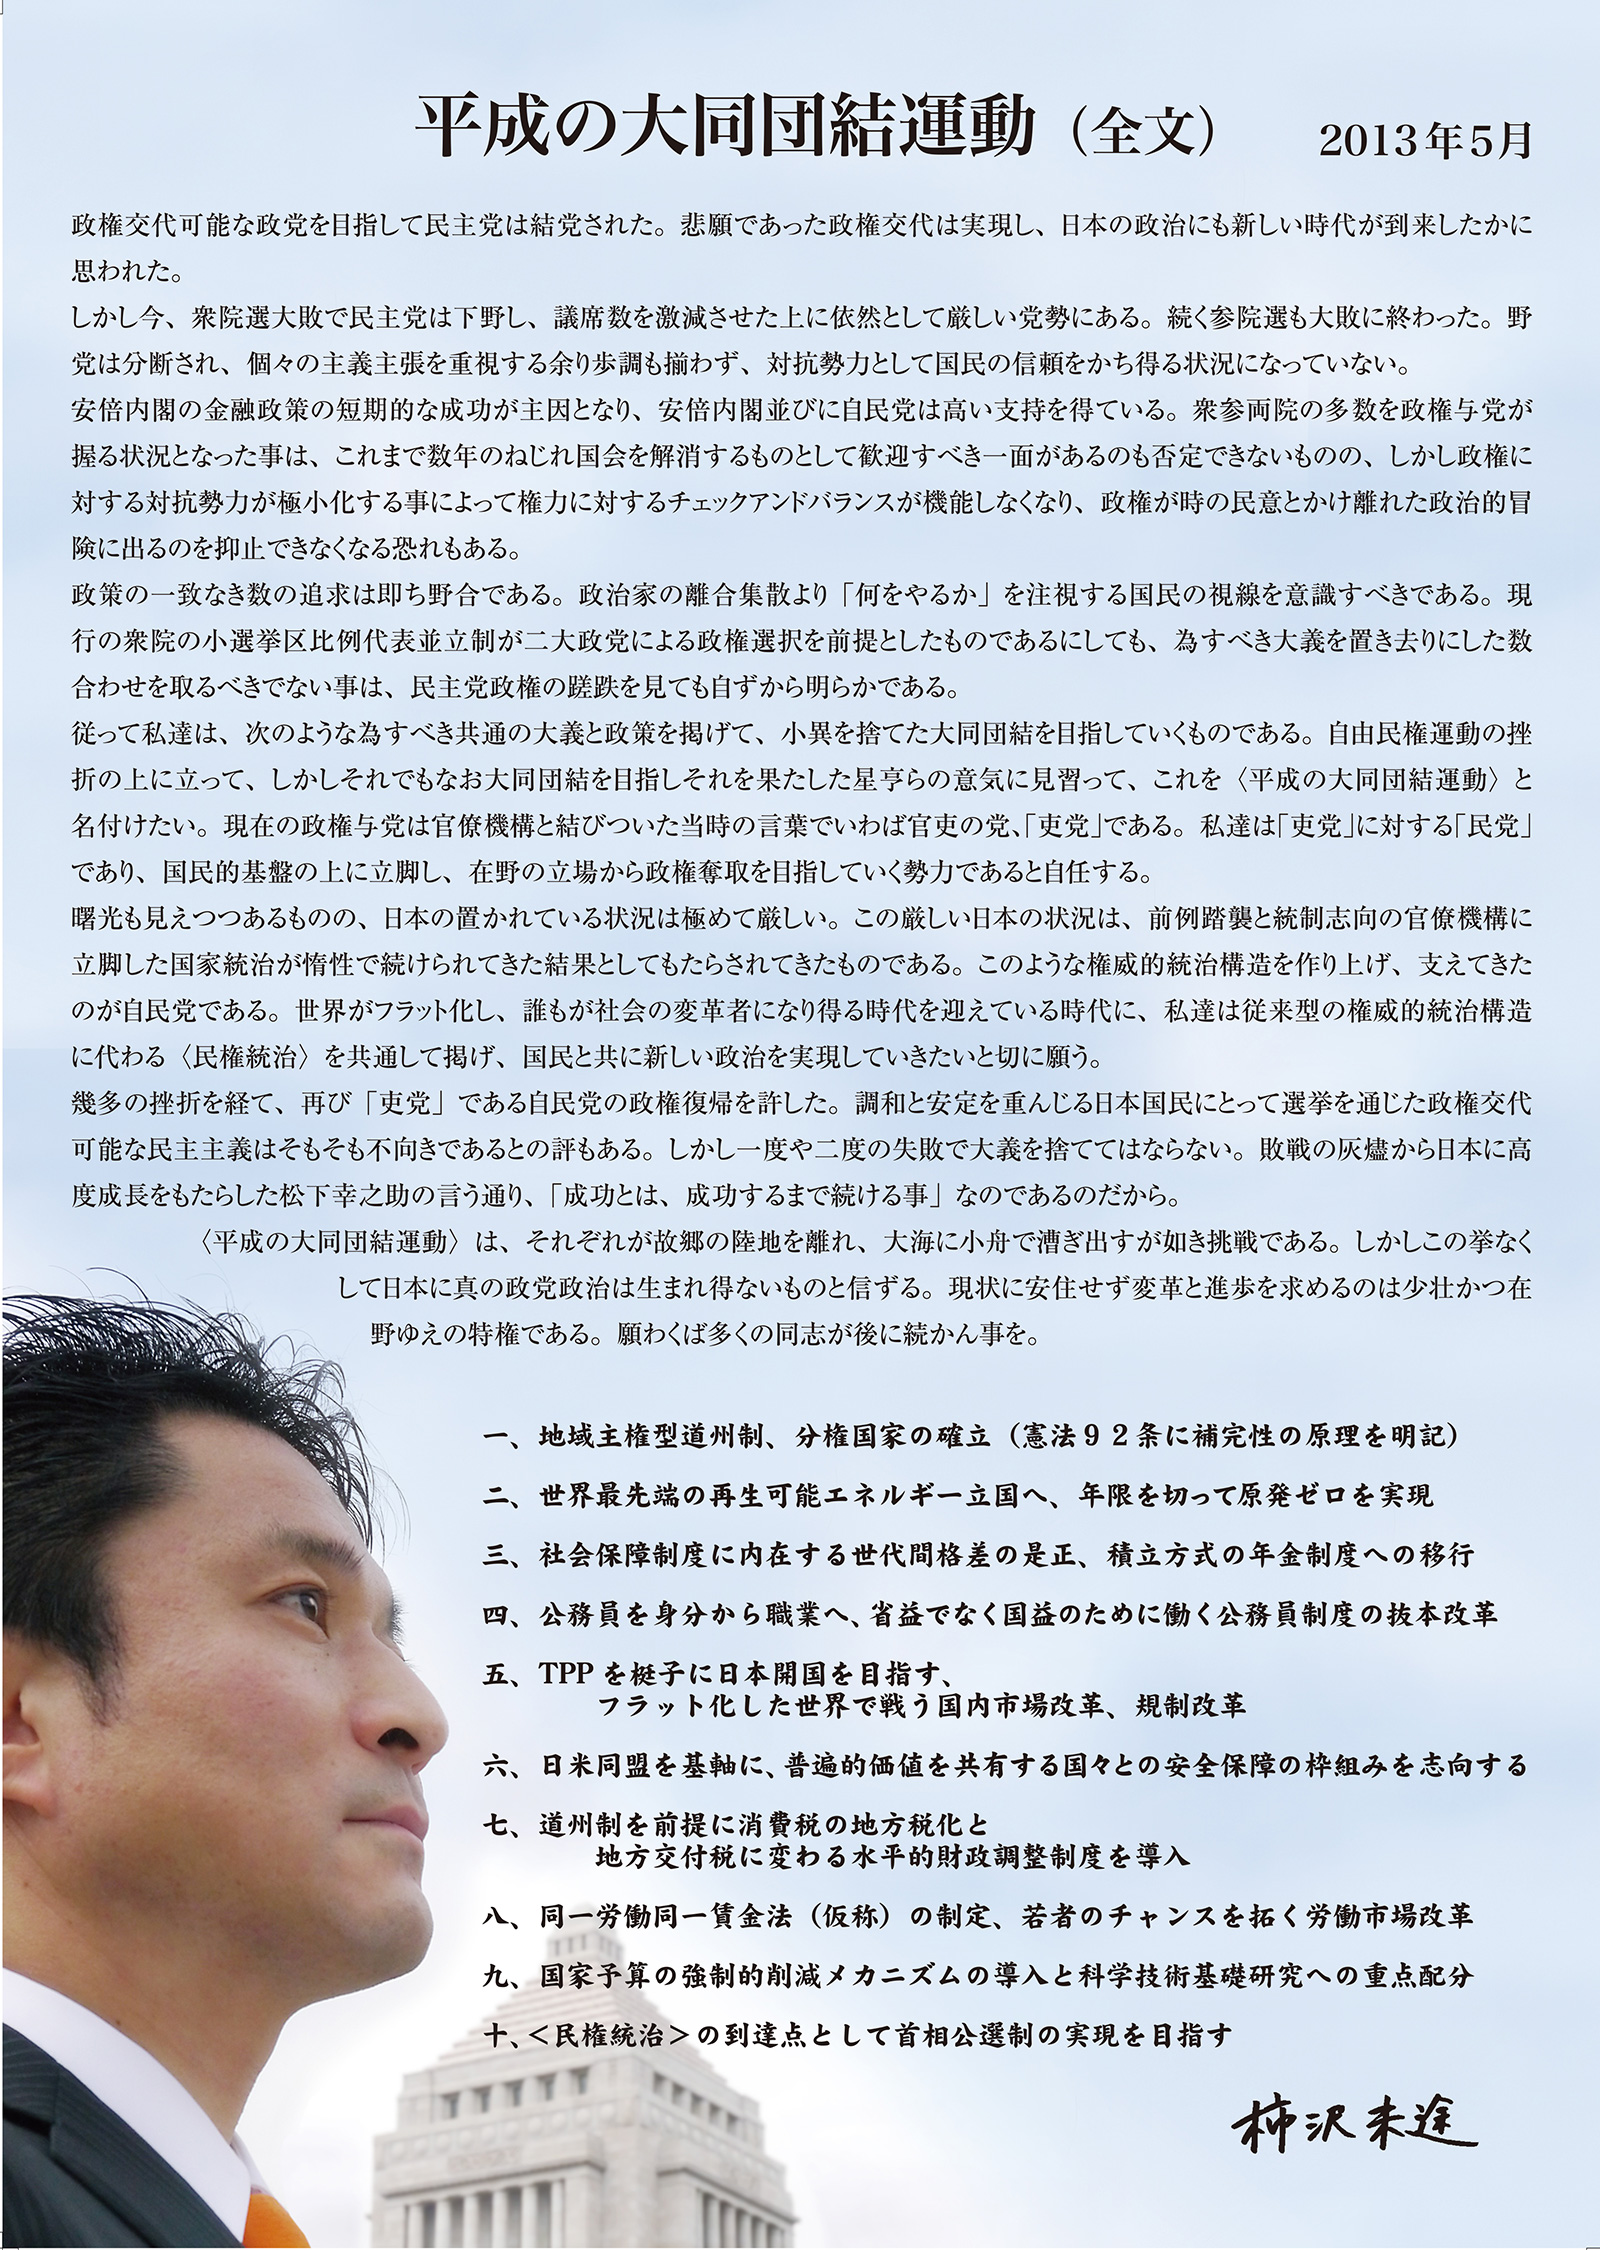 柿沢未途 平成の大同団結運動(全文)